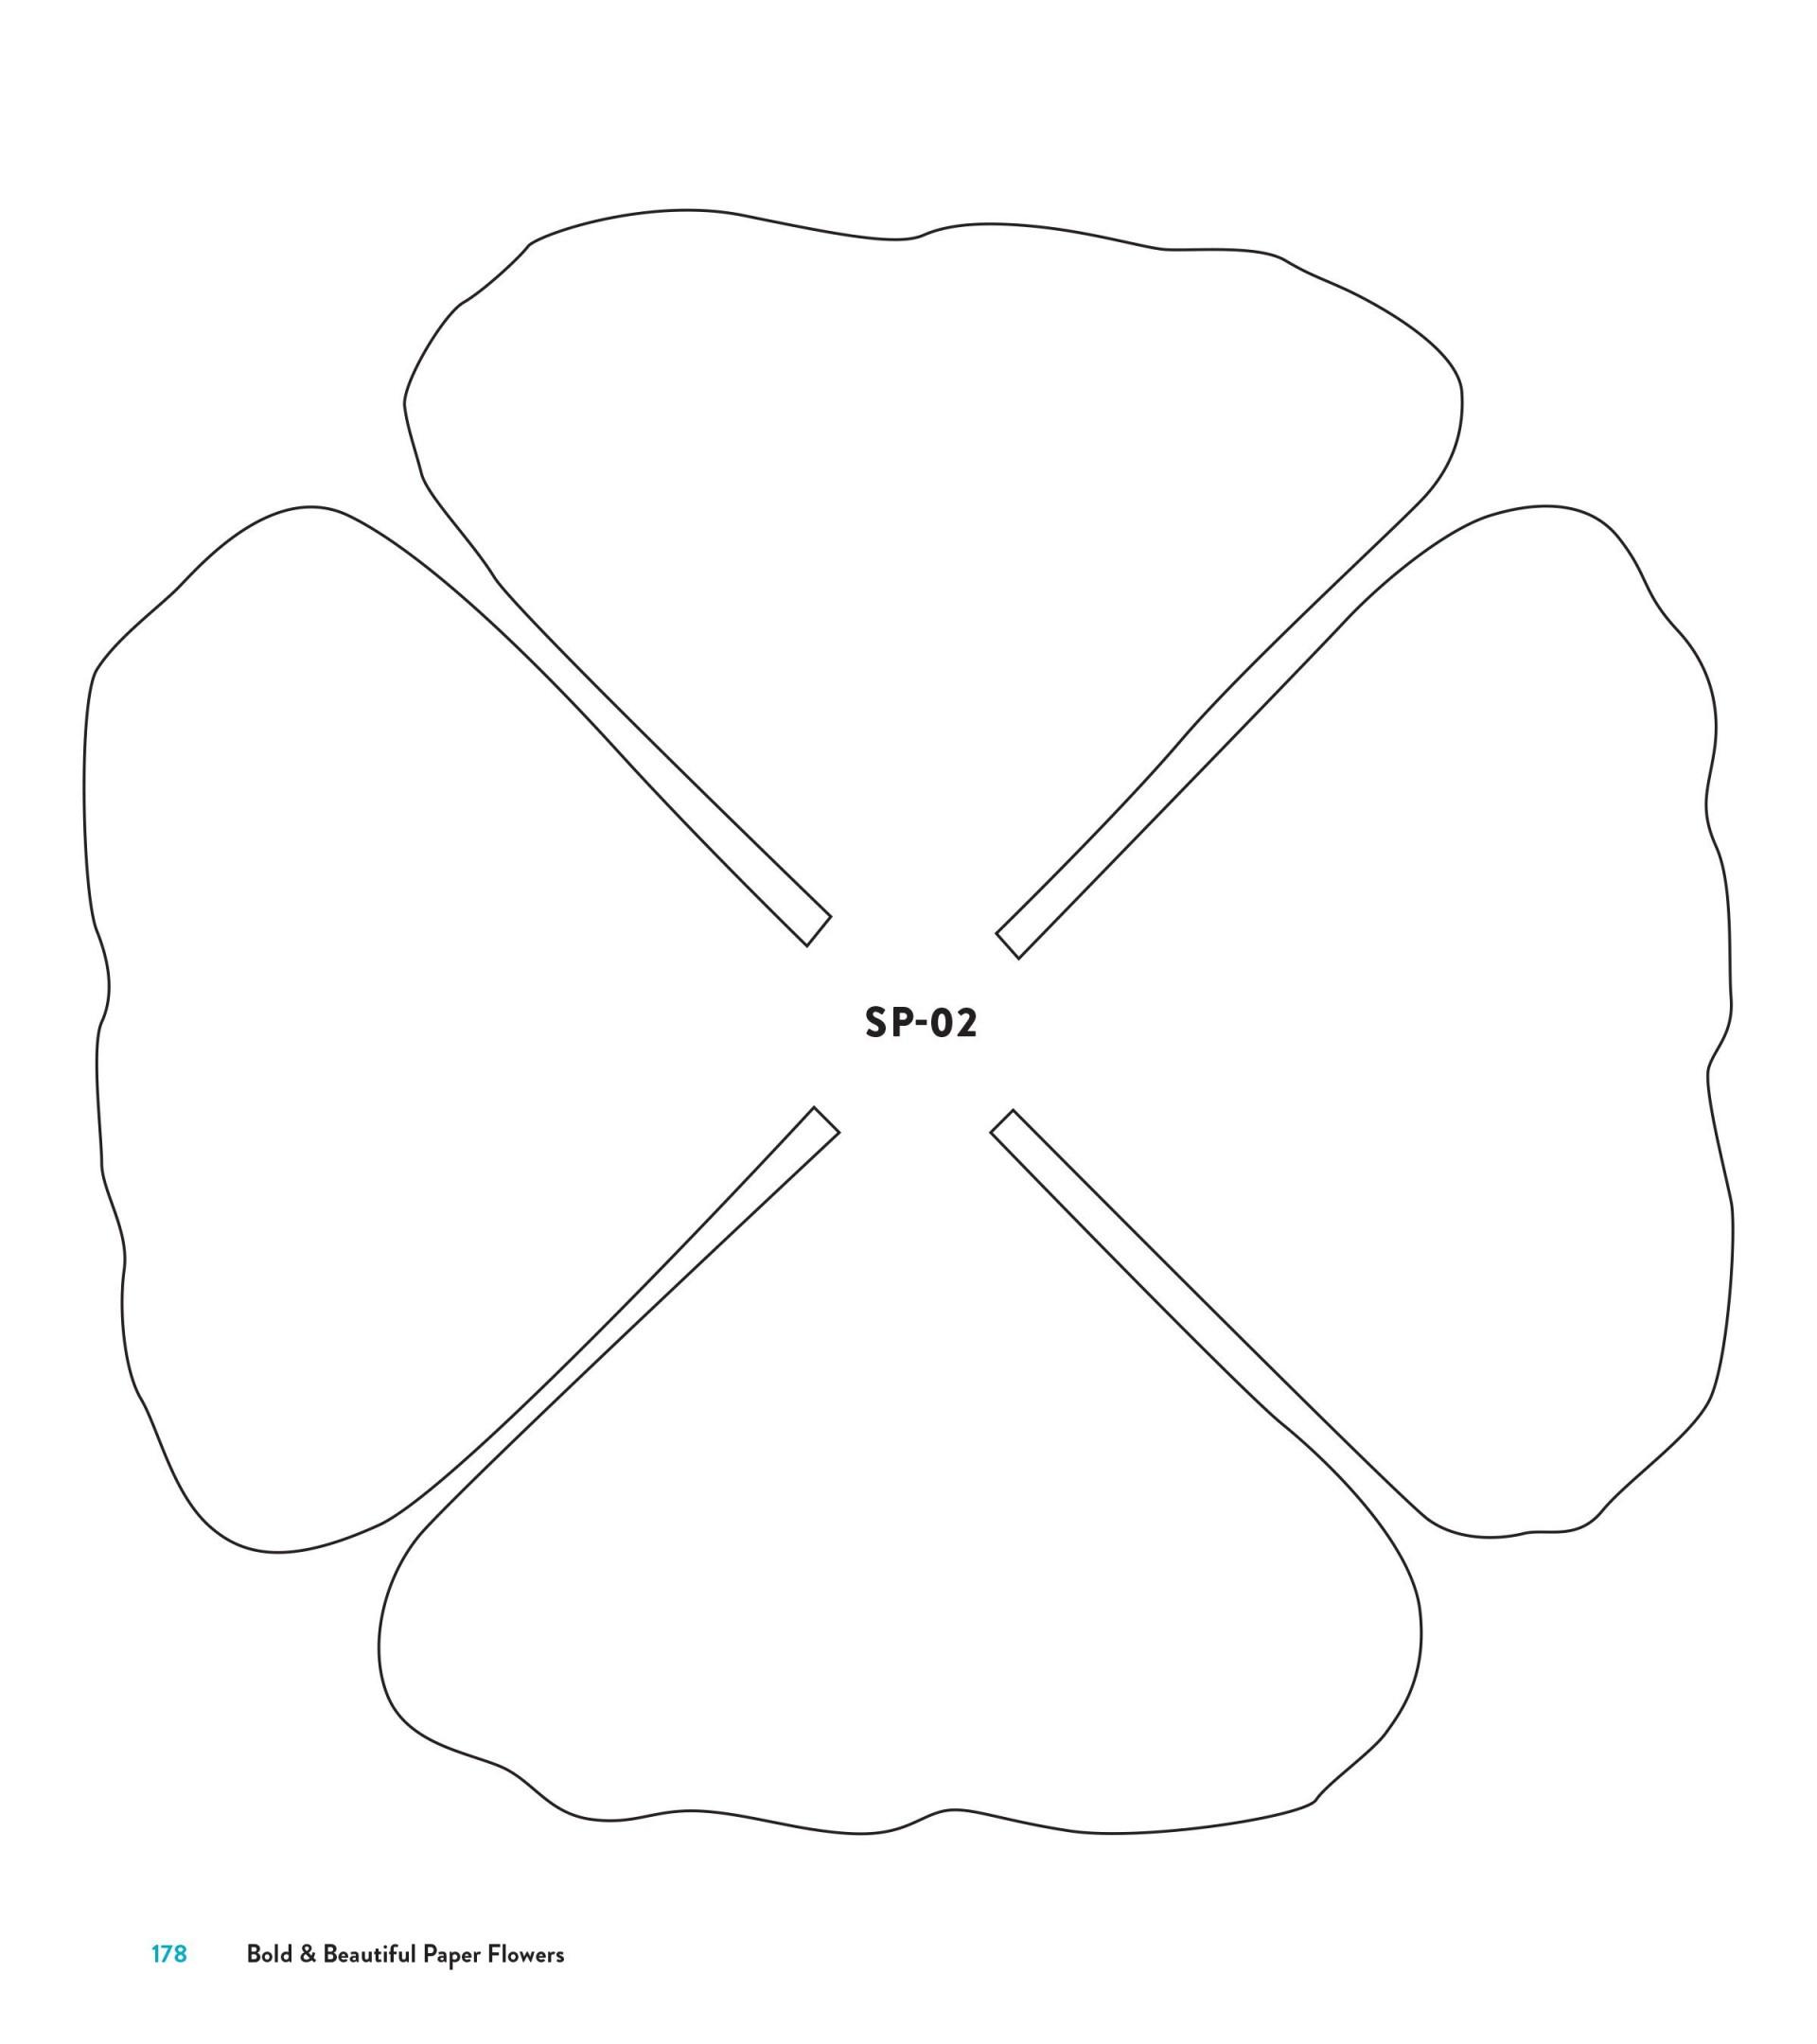 005 Striking Downloadable Free Printable Paper Flower Template Sample  Templates1920